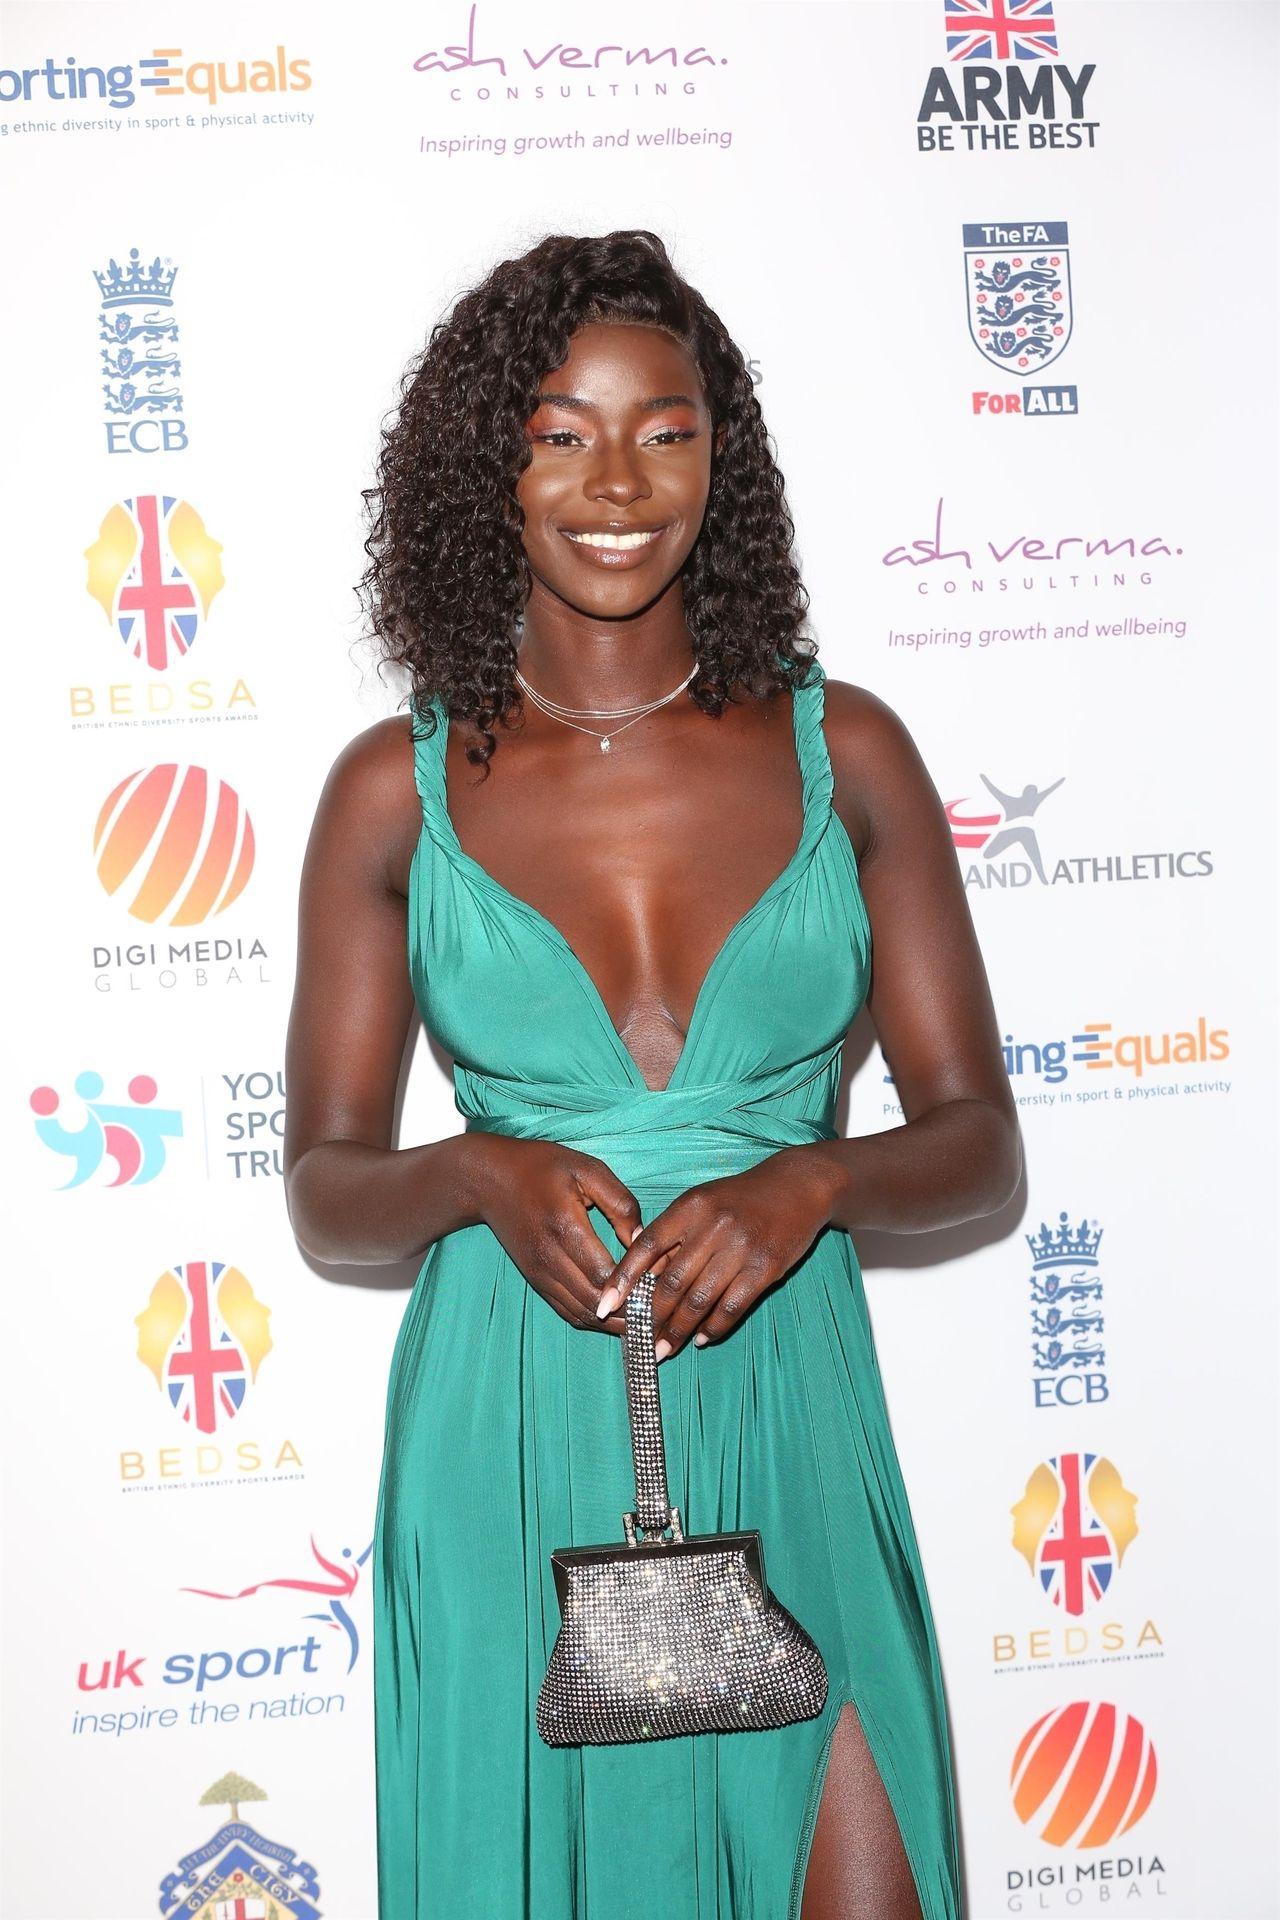 Mike Boateng & Priscilla Anyabu Are Seen At British Ethnic Diversity Sports Awards 0020